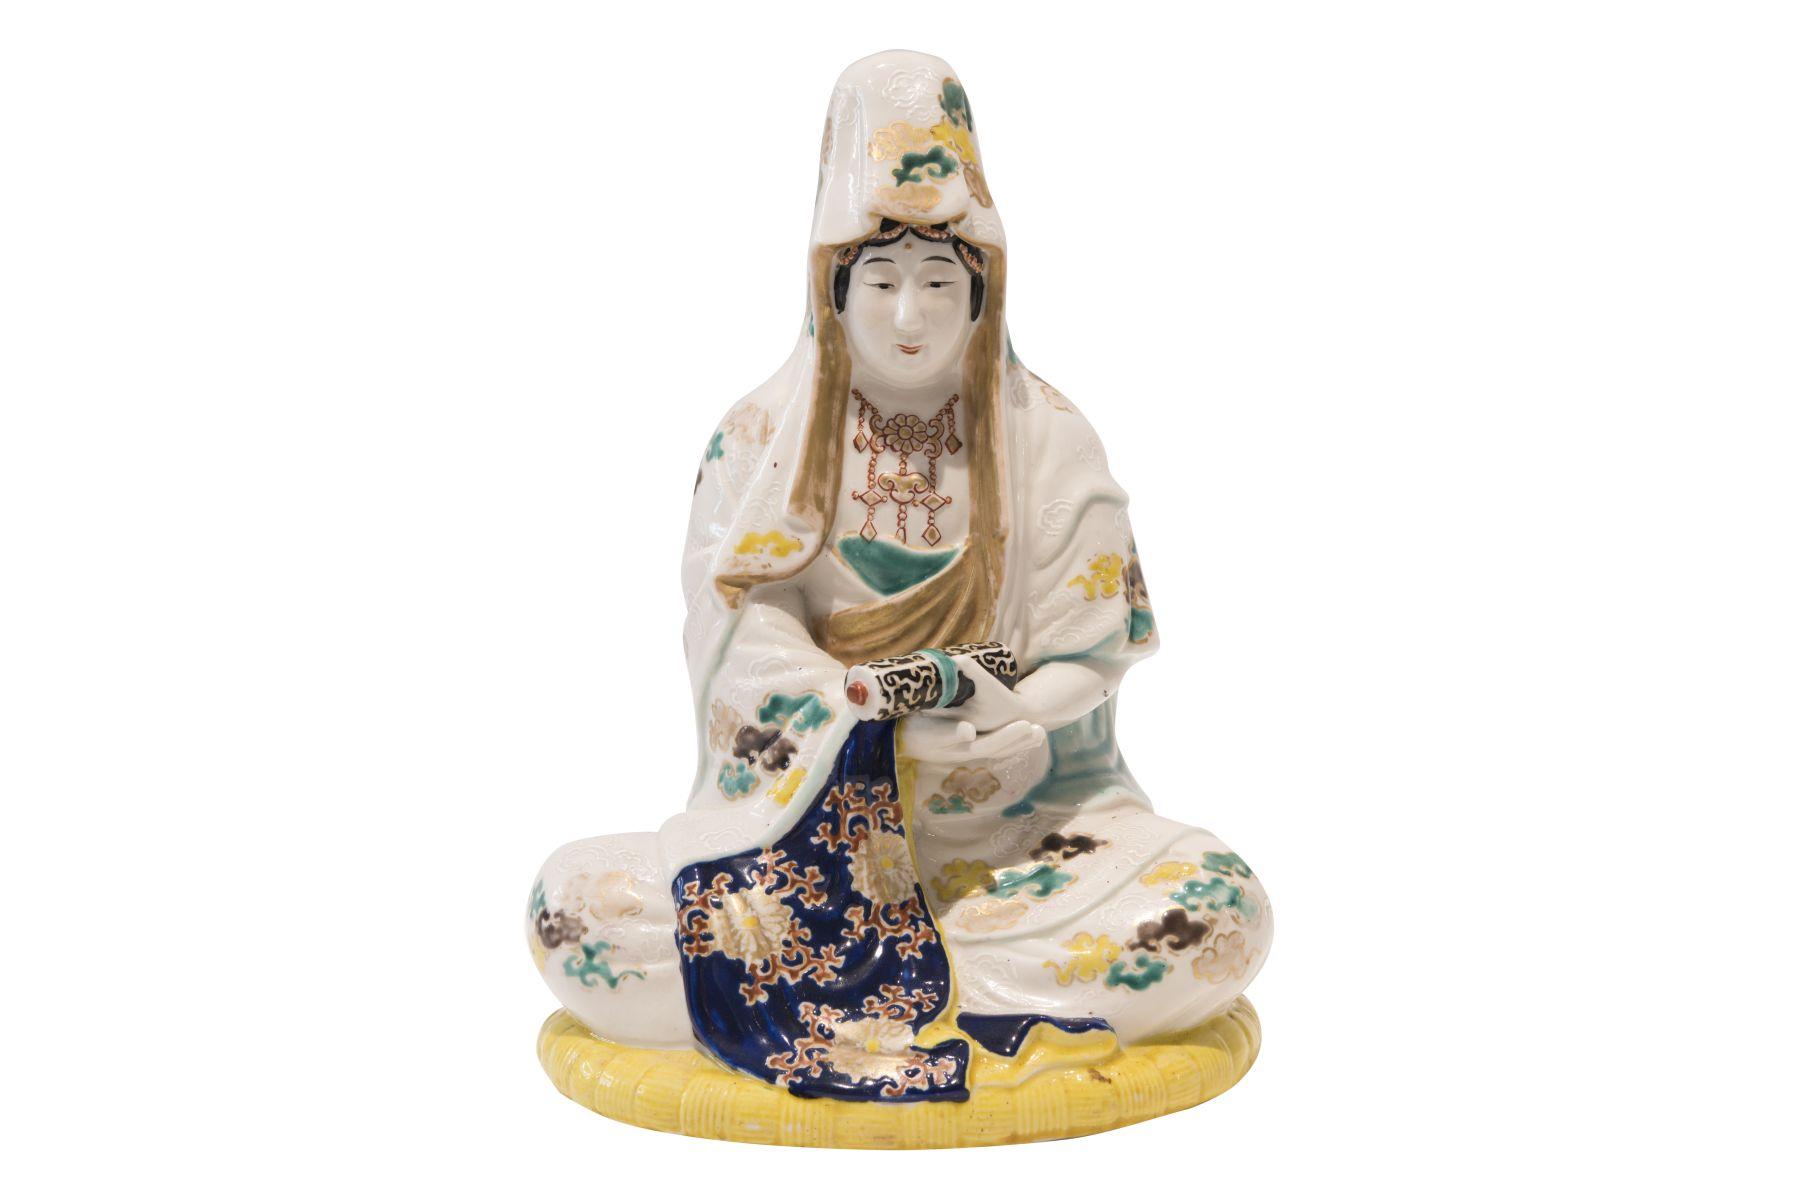 #197 Seated female porcelain figure | Sitzende weibliche Porzellanfigur Image